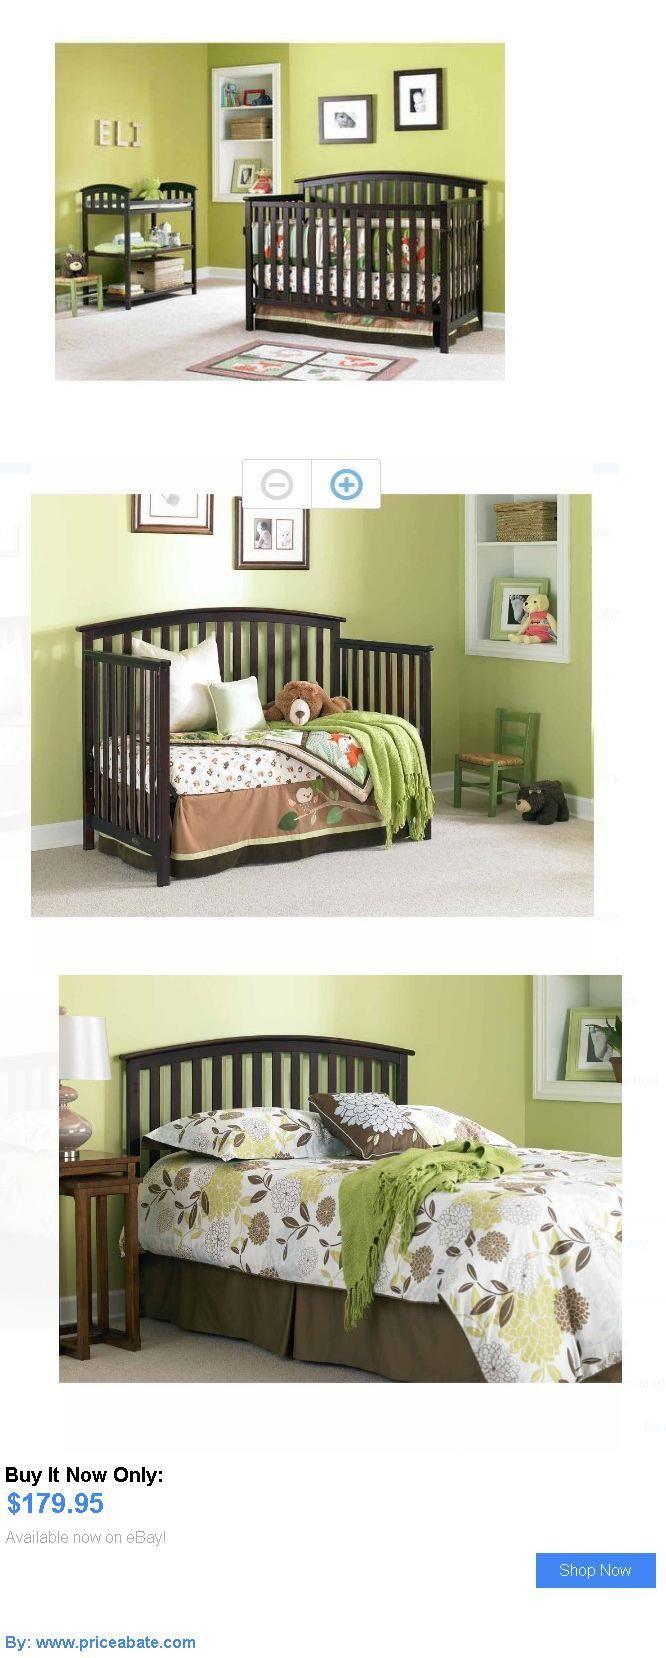 Baby Nursery: Baby Cribs And Furniture 4 In 1 Convertible Espresso Toddler Bed Nursery Child BUY IT NOW ONLY: $179.95 #priceabateBabyNursery OR #priceabate